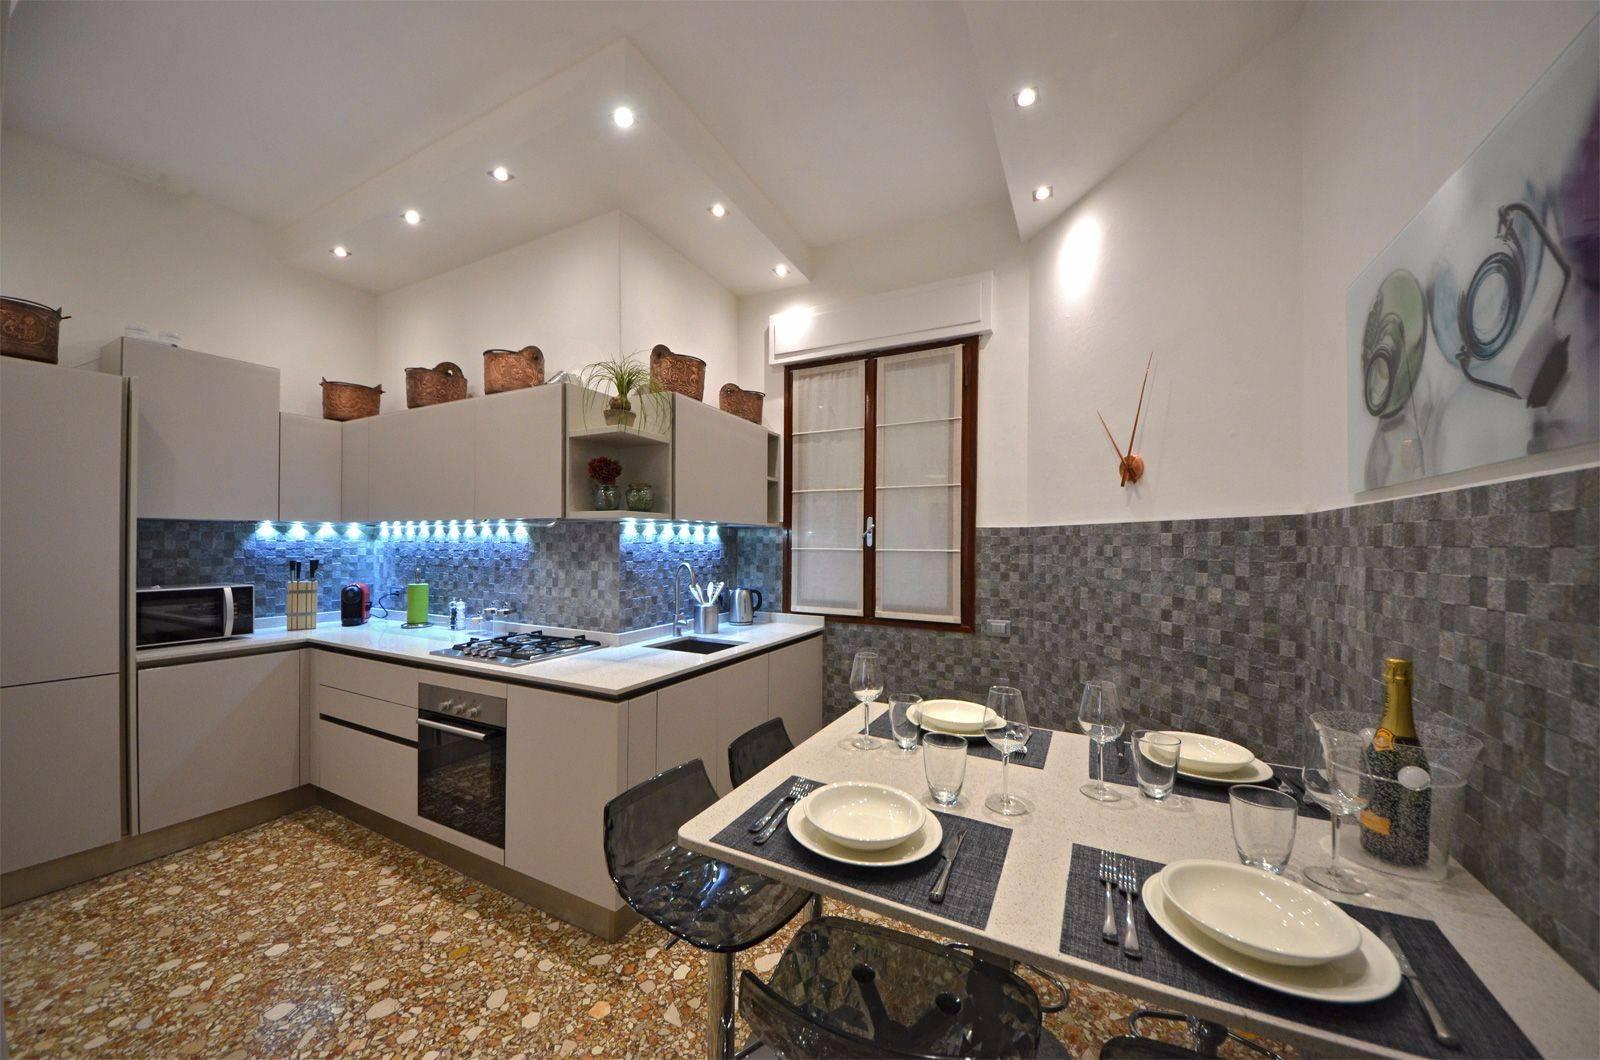 Piano Nobile kitchen